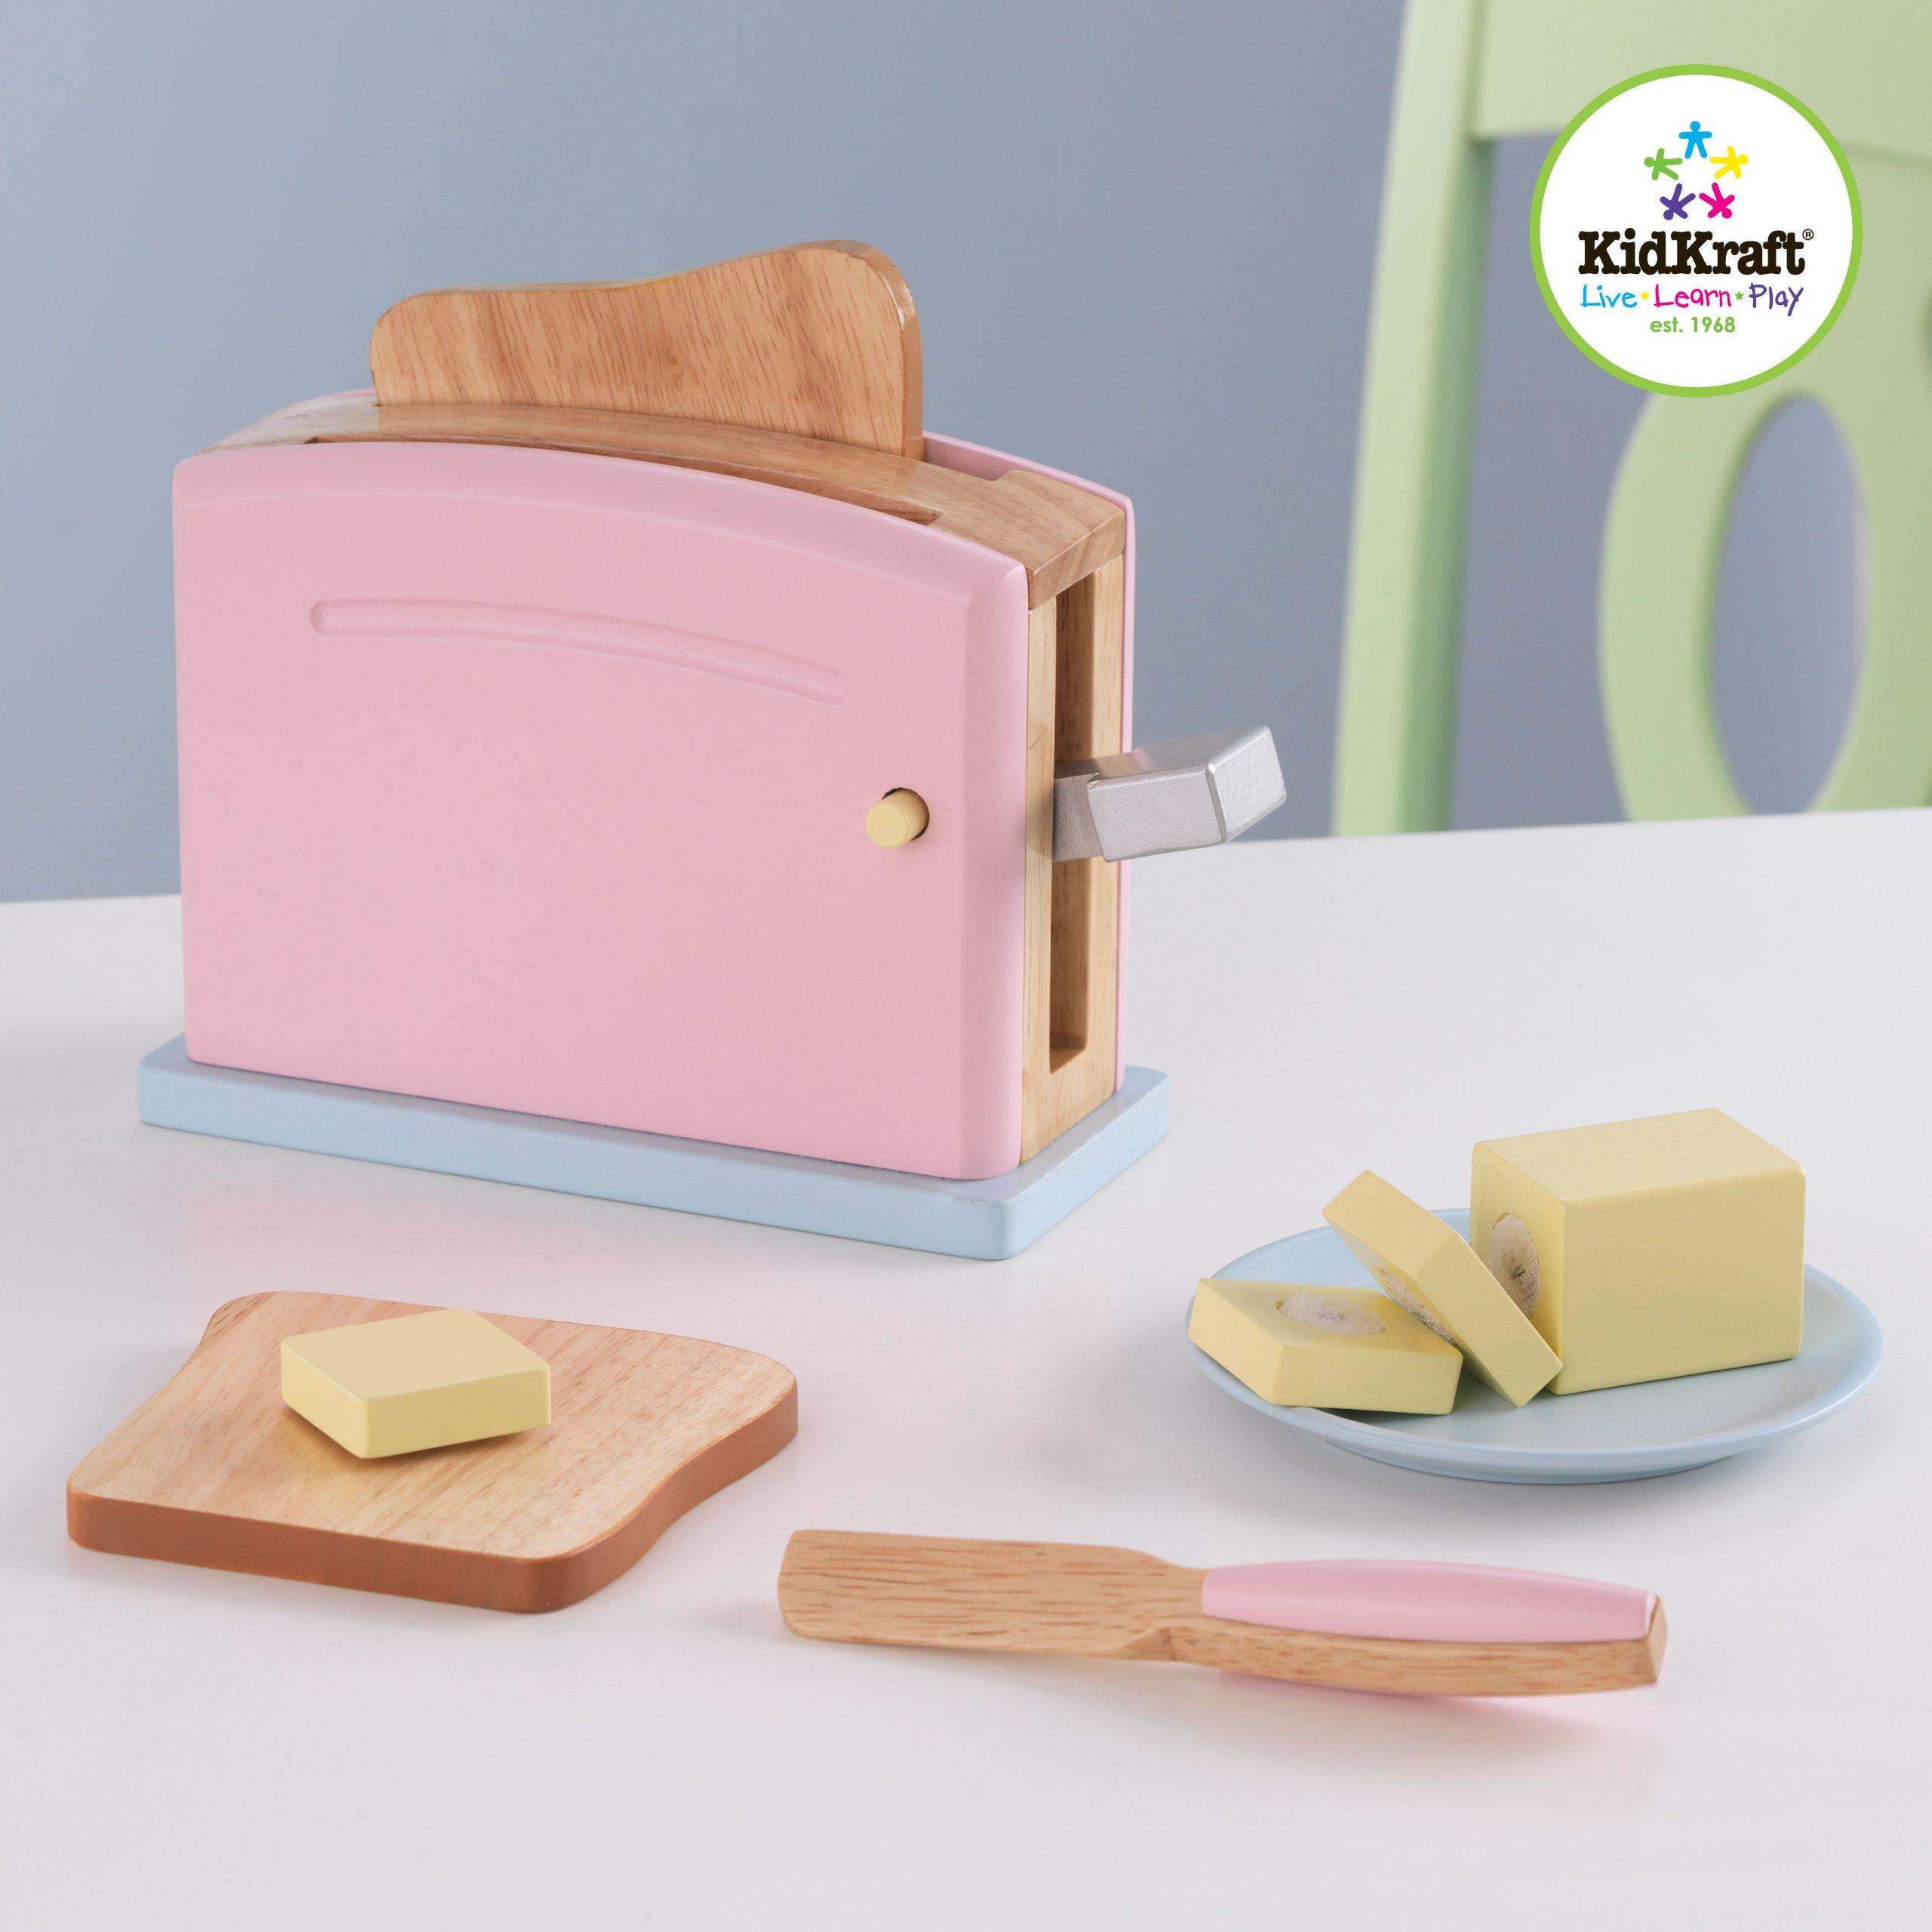 KidKraft Wooden New Toaster Set - Pastel by KidKraft (Image #2)